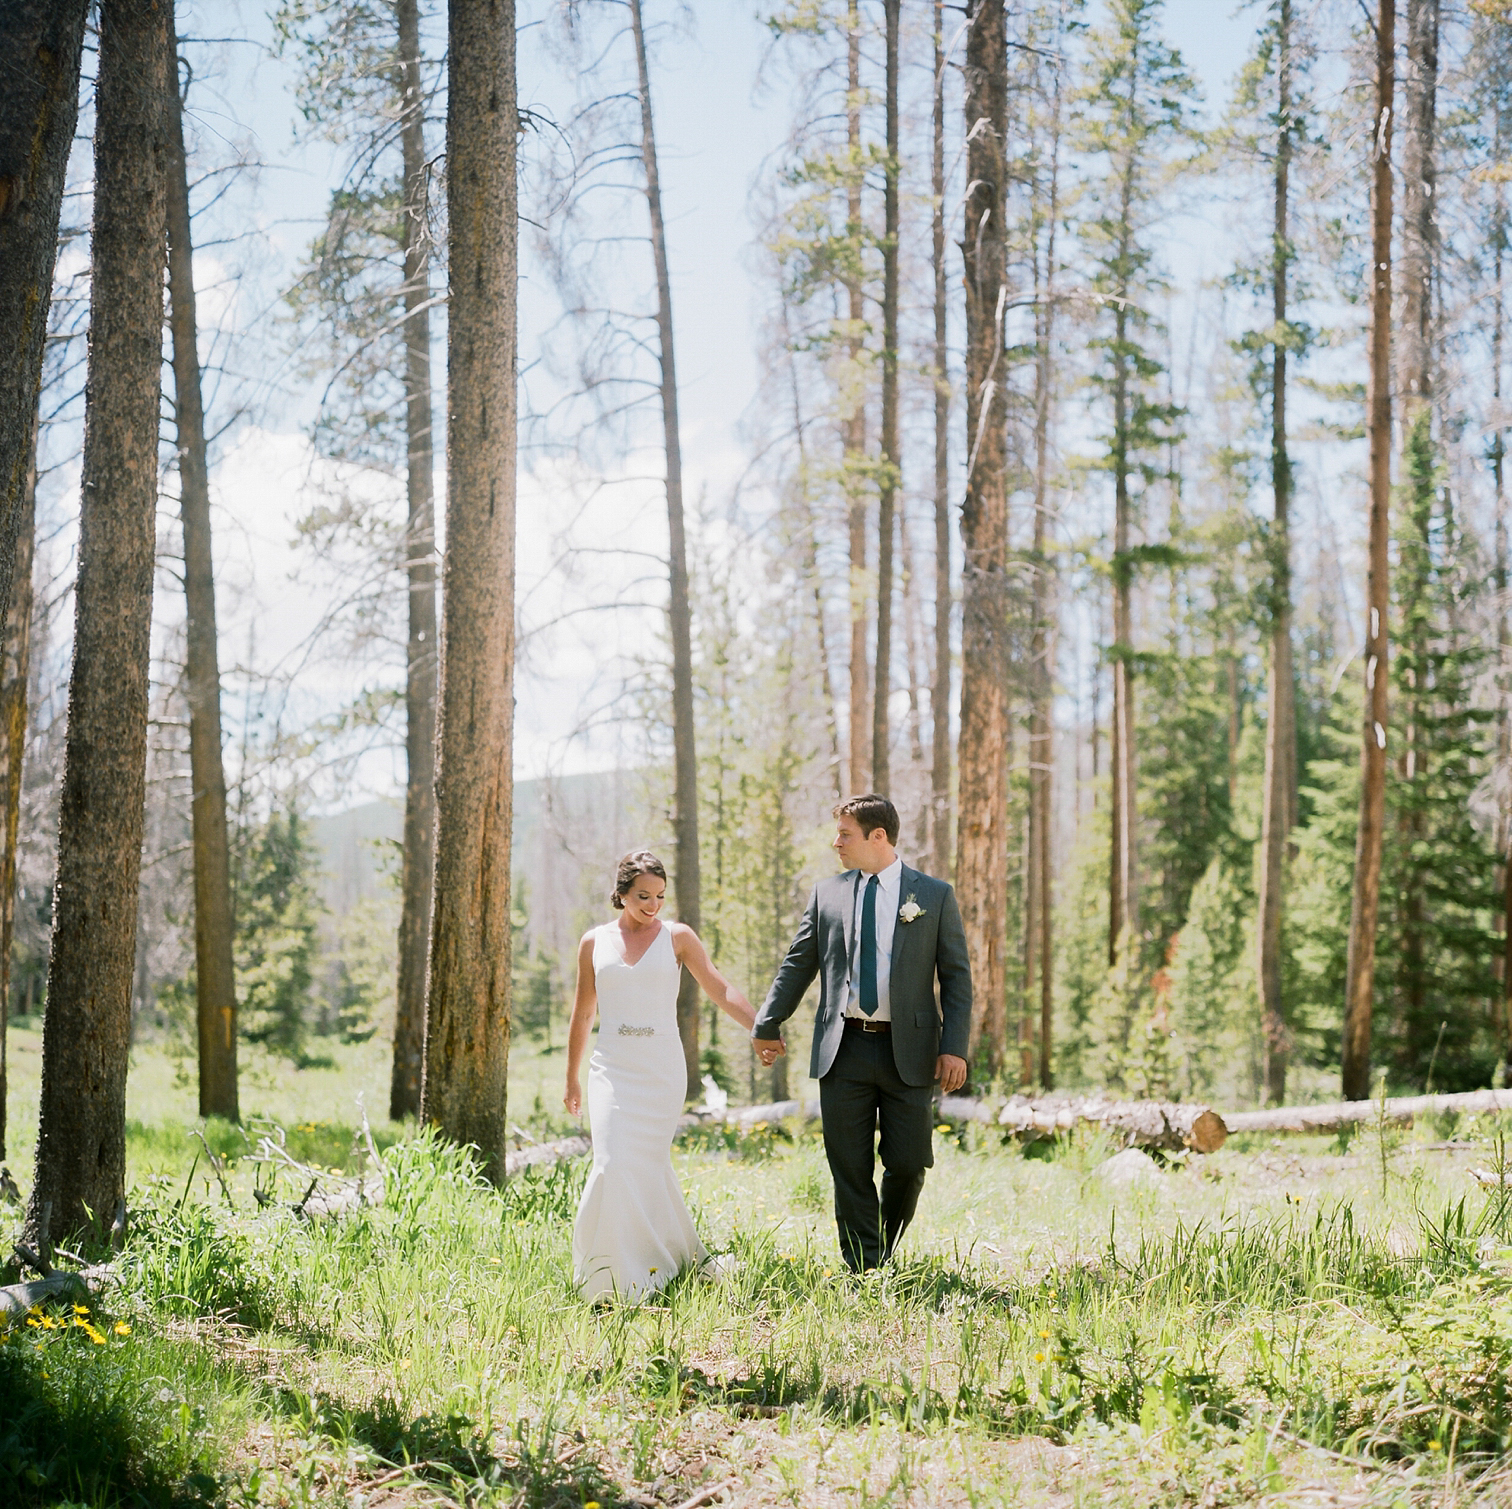 Colorado Destination First Look In Wood Vail Wedding Photographer Film